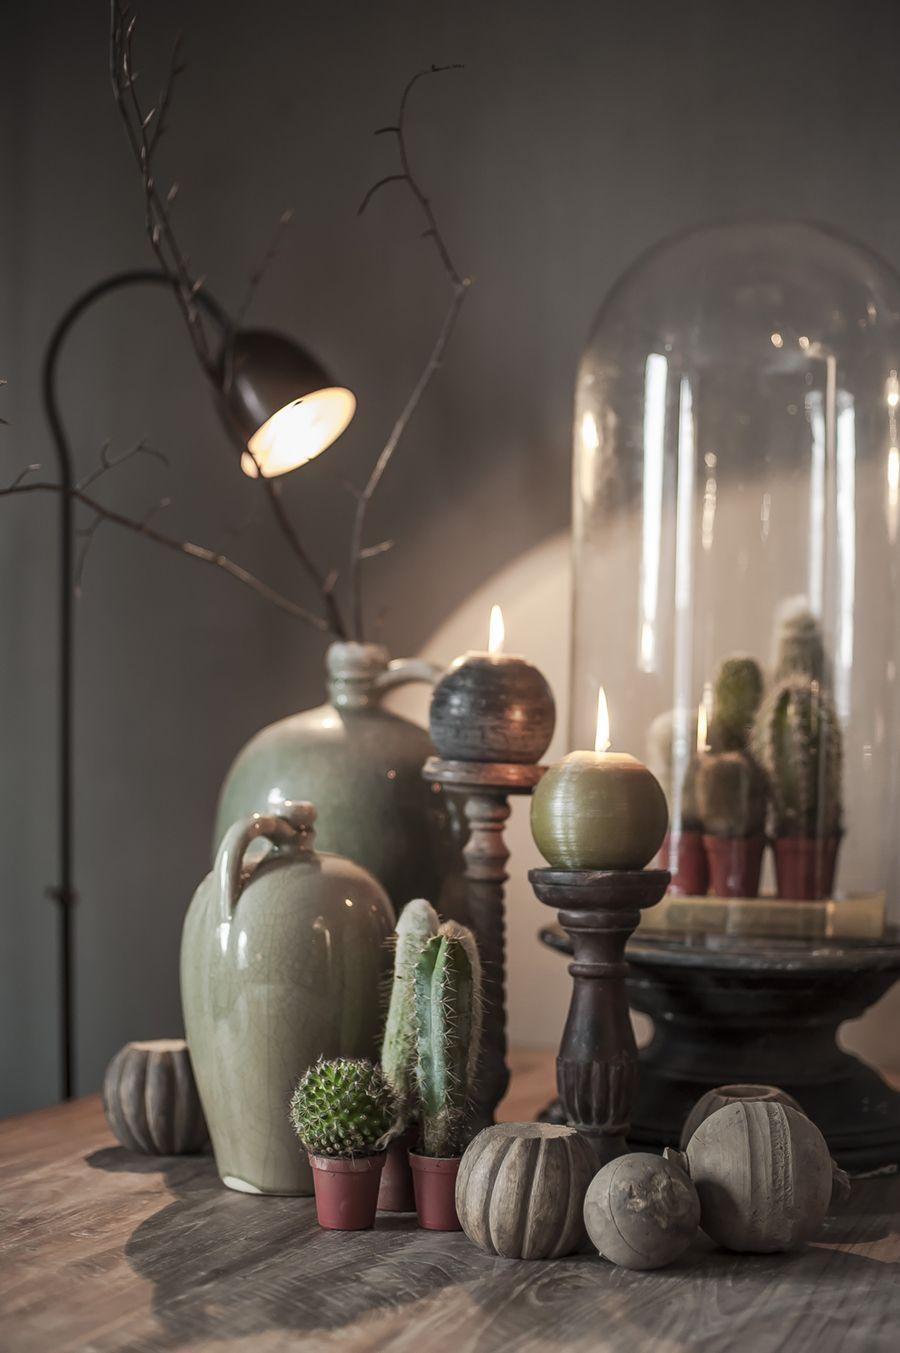 woonaccessoires en oud houten accessoires hoffz interieur wwwtwoonhuisnl